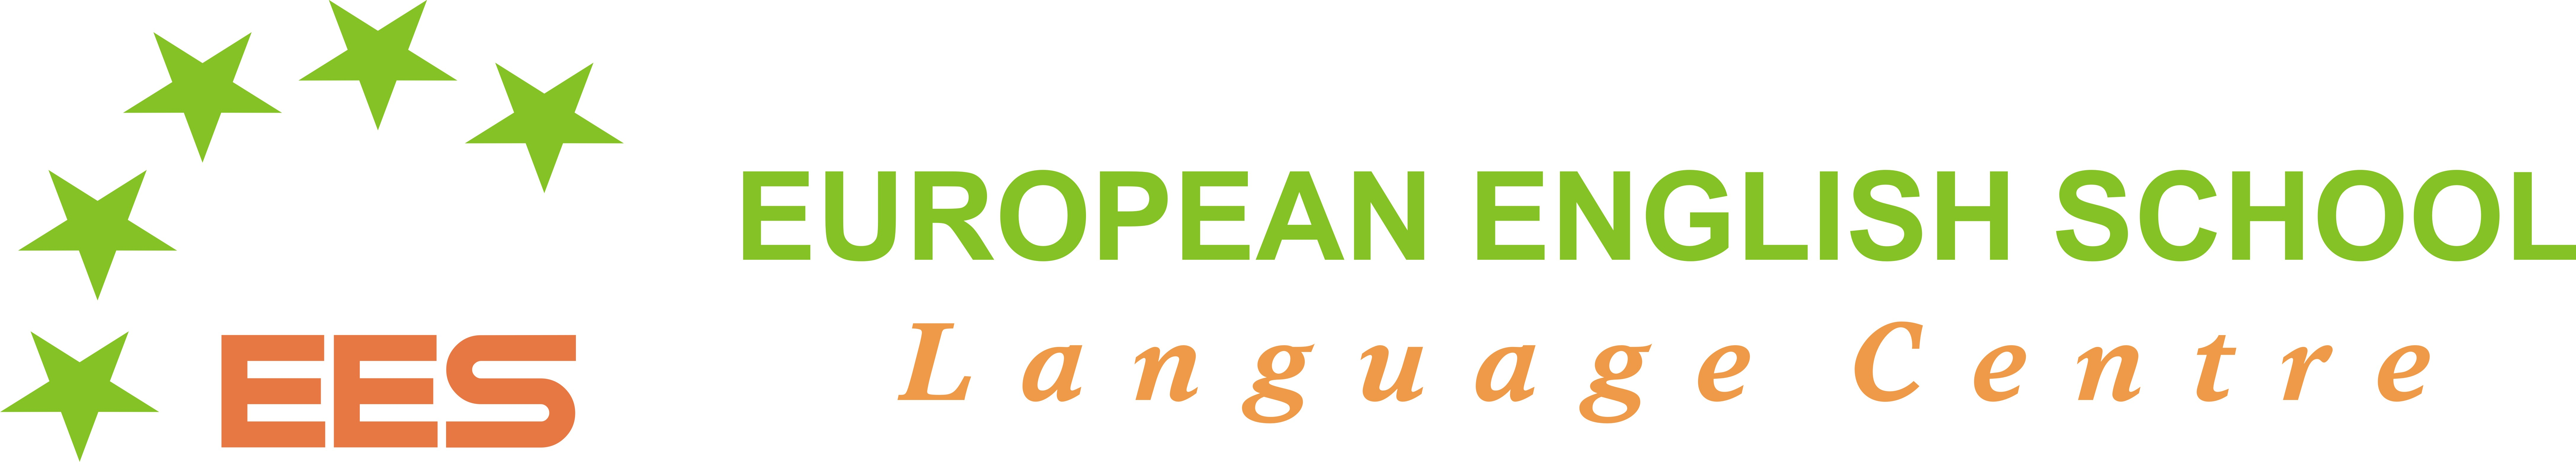 europeanenglishschool.com